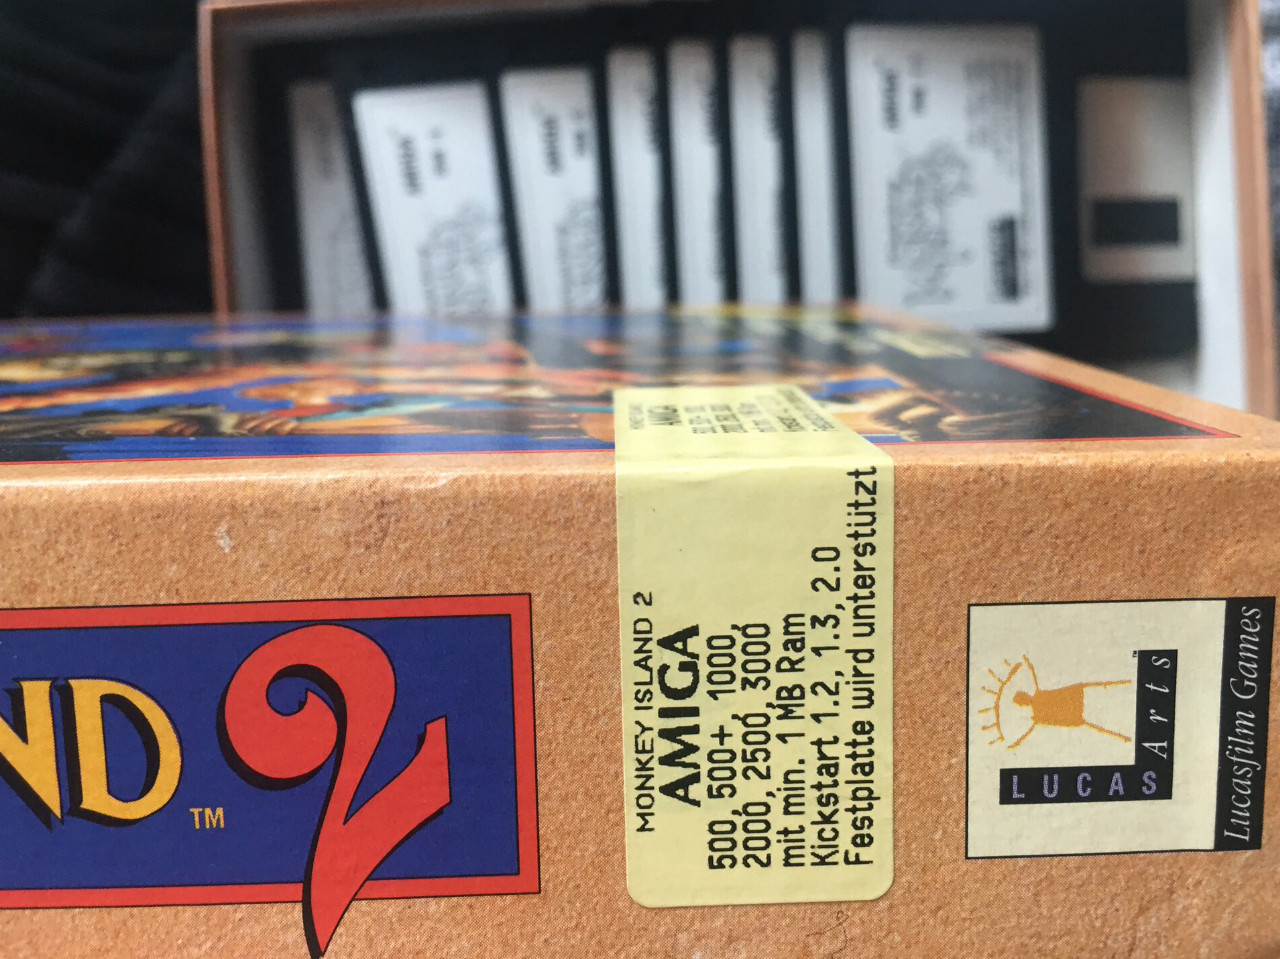 Ein Amiga, eine Turbokarte, ein Mann. (Bild: Andreas Wanda)